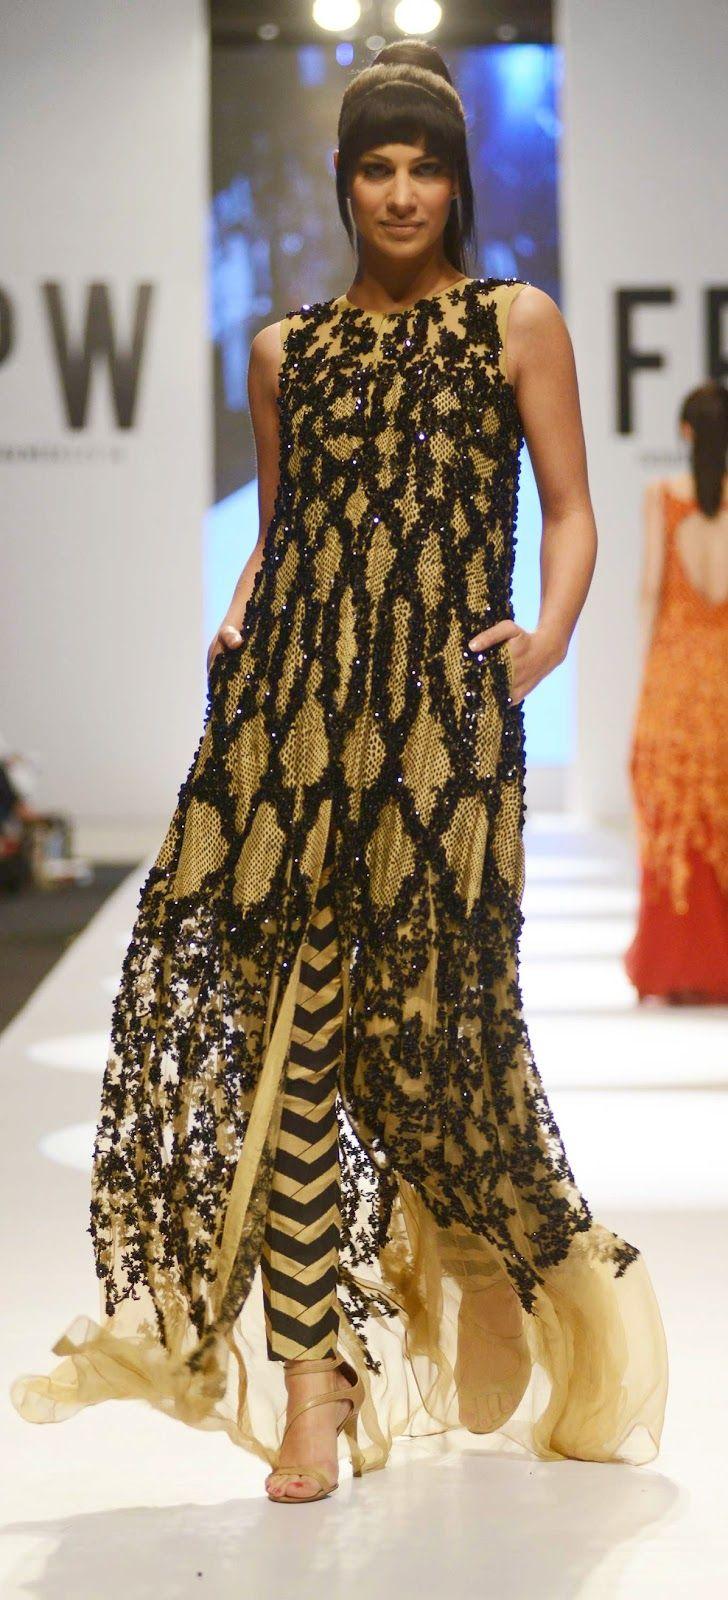 Karachista: Fashion Pakistan Week 6 - HSY - Hassan Sheheryar Yasin - Spring 2014 - Venom collection